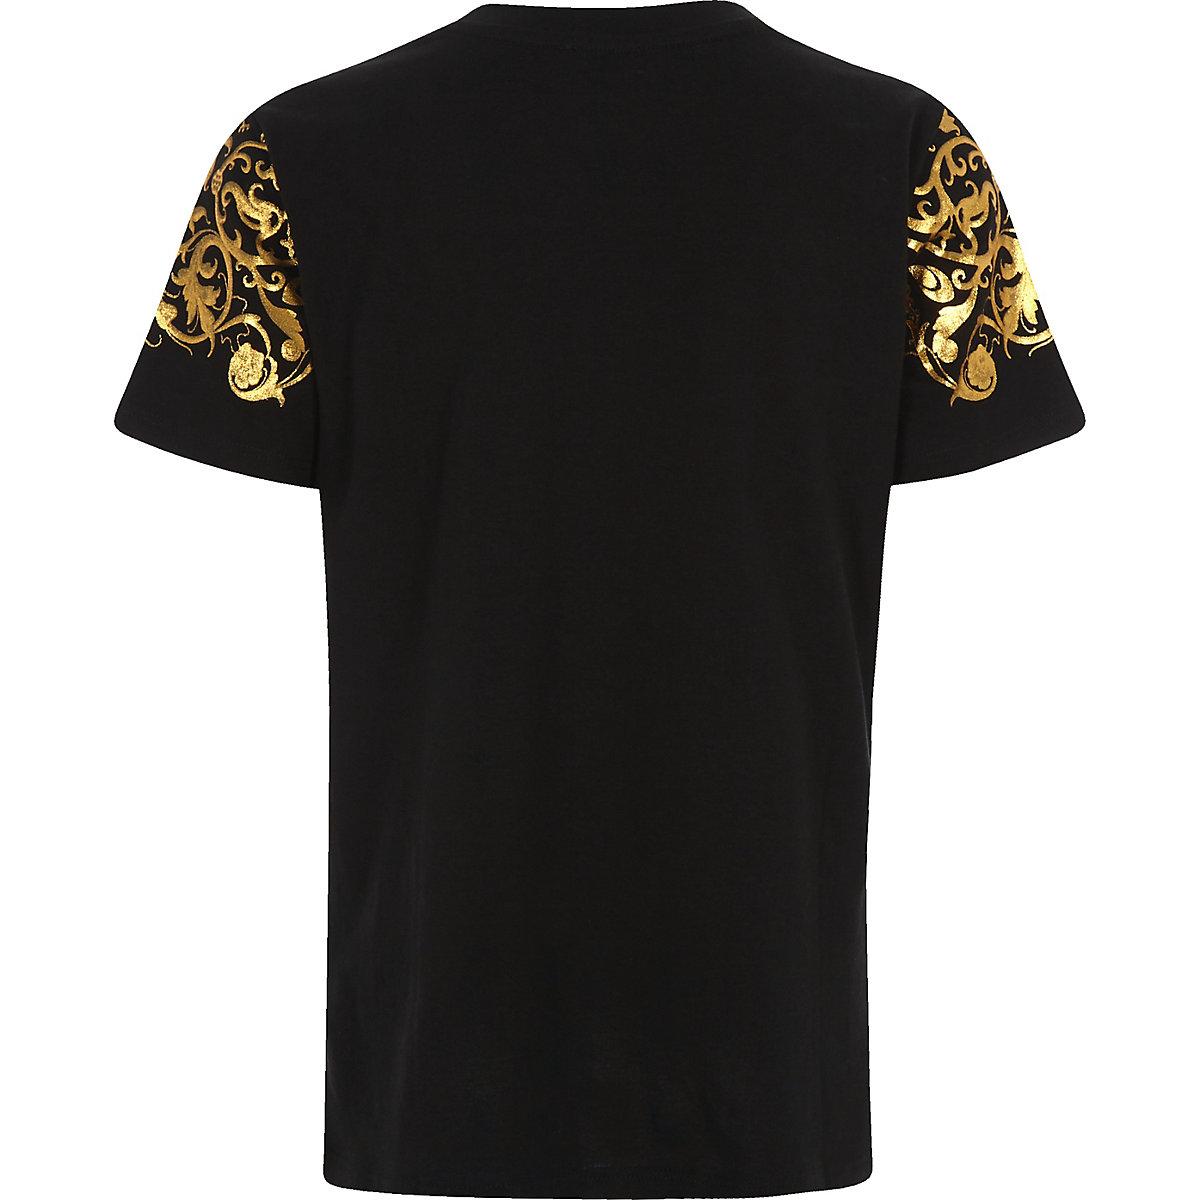 Boys Exclusive Gold Foil Print T Shirt T Shirts T Shirts